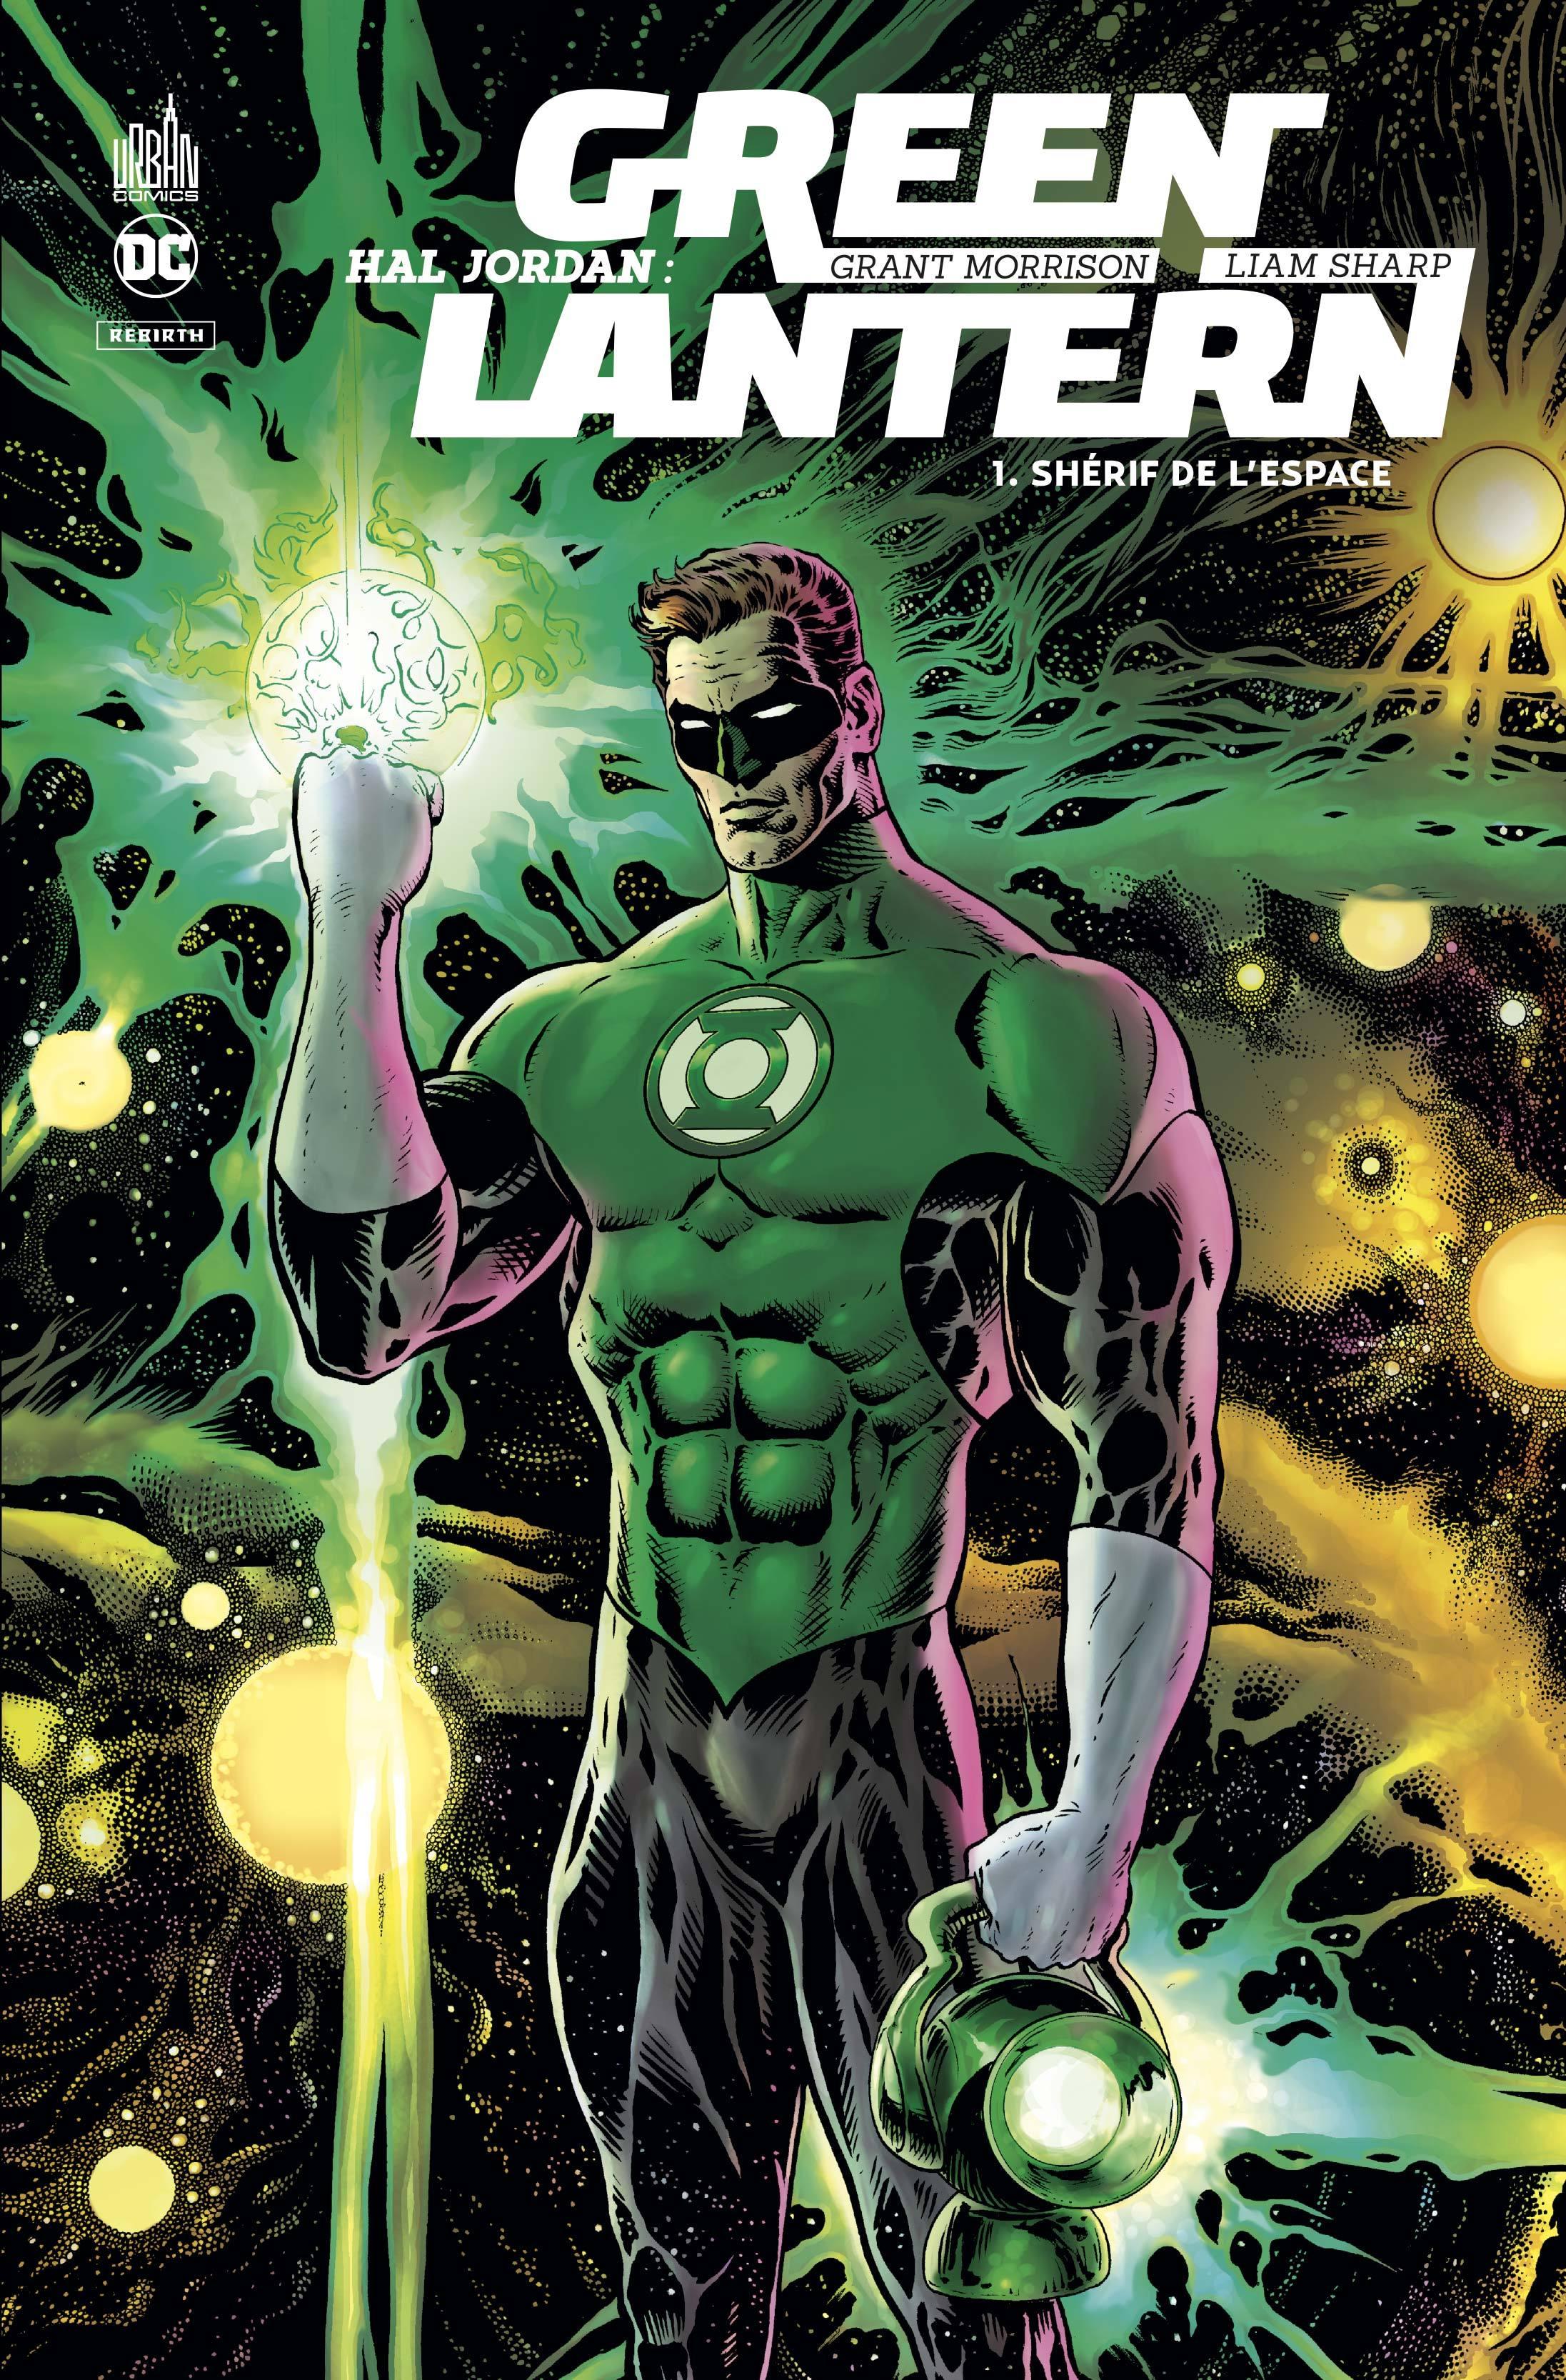 DC REBIRTH - HAL JORDAN : GREEN LANTERN TOME 1